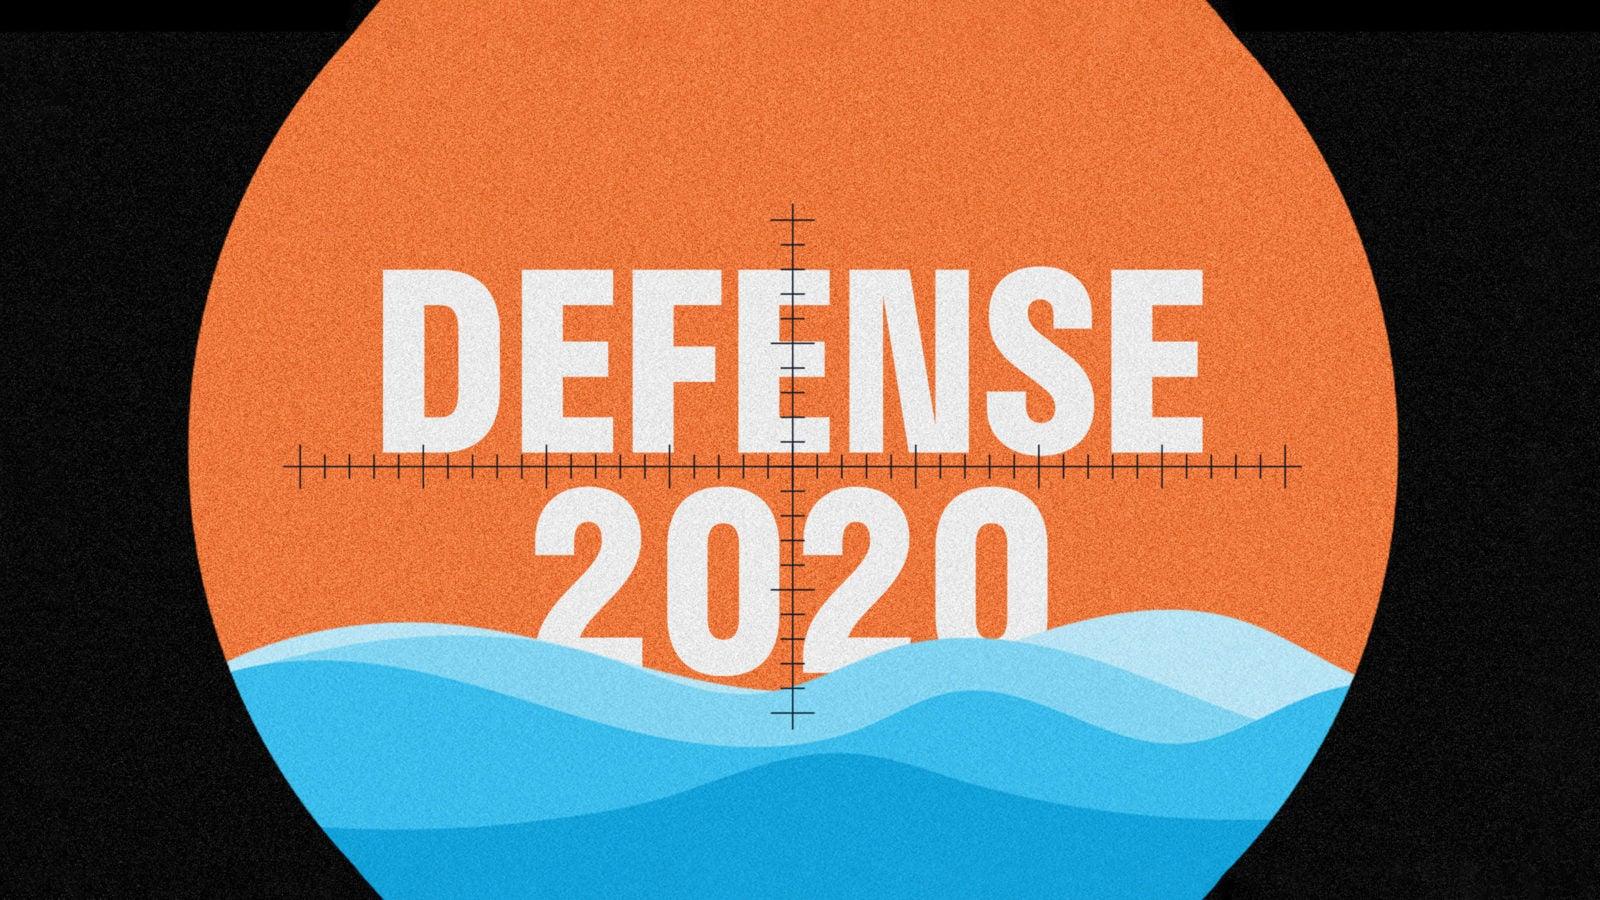 Defense 2020 logo